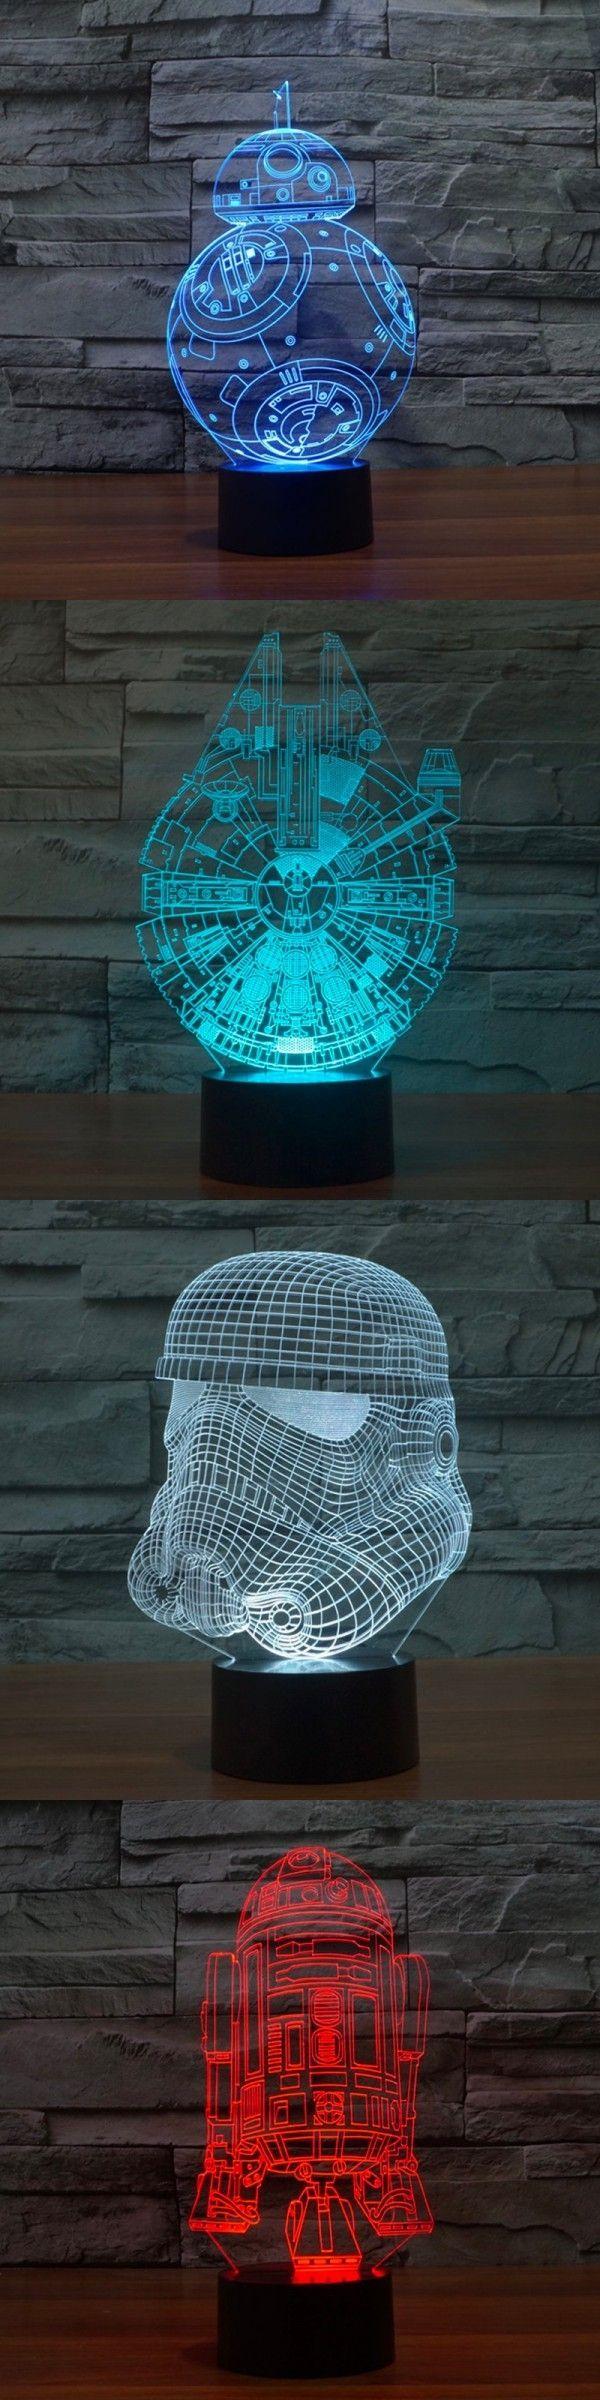 3d Illusion Led Desk Table Lamps Ultimate Star Wars Star Wars Room Star Wars Decor